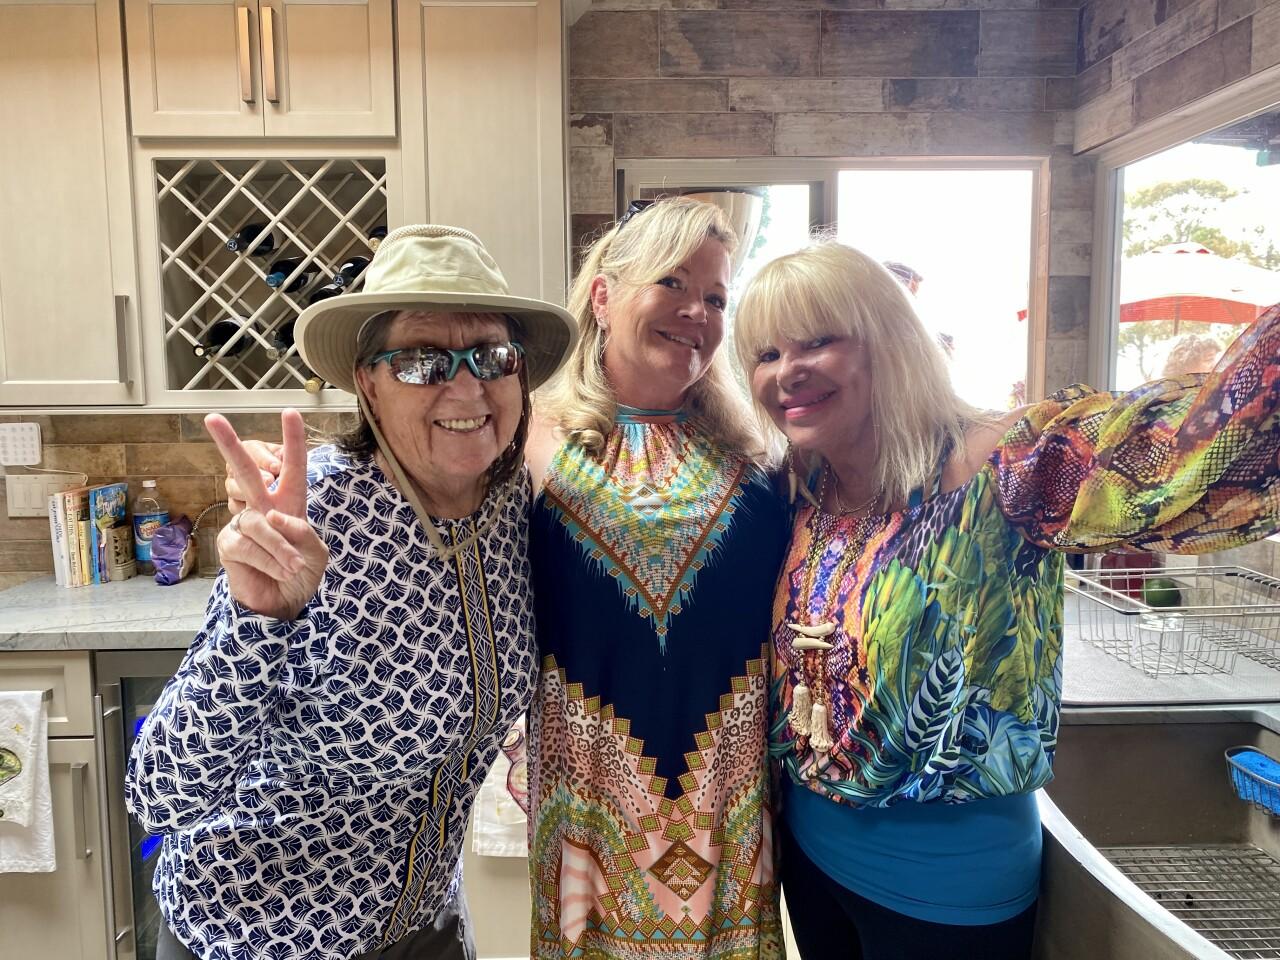 Jan Czarnecki, Sophia Richardson and Linda Mitchel Jimas gather at Mitchel Jimas' tennis happy hour July 28 in La Jolla.